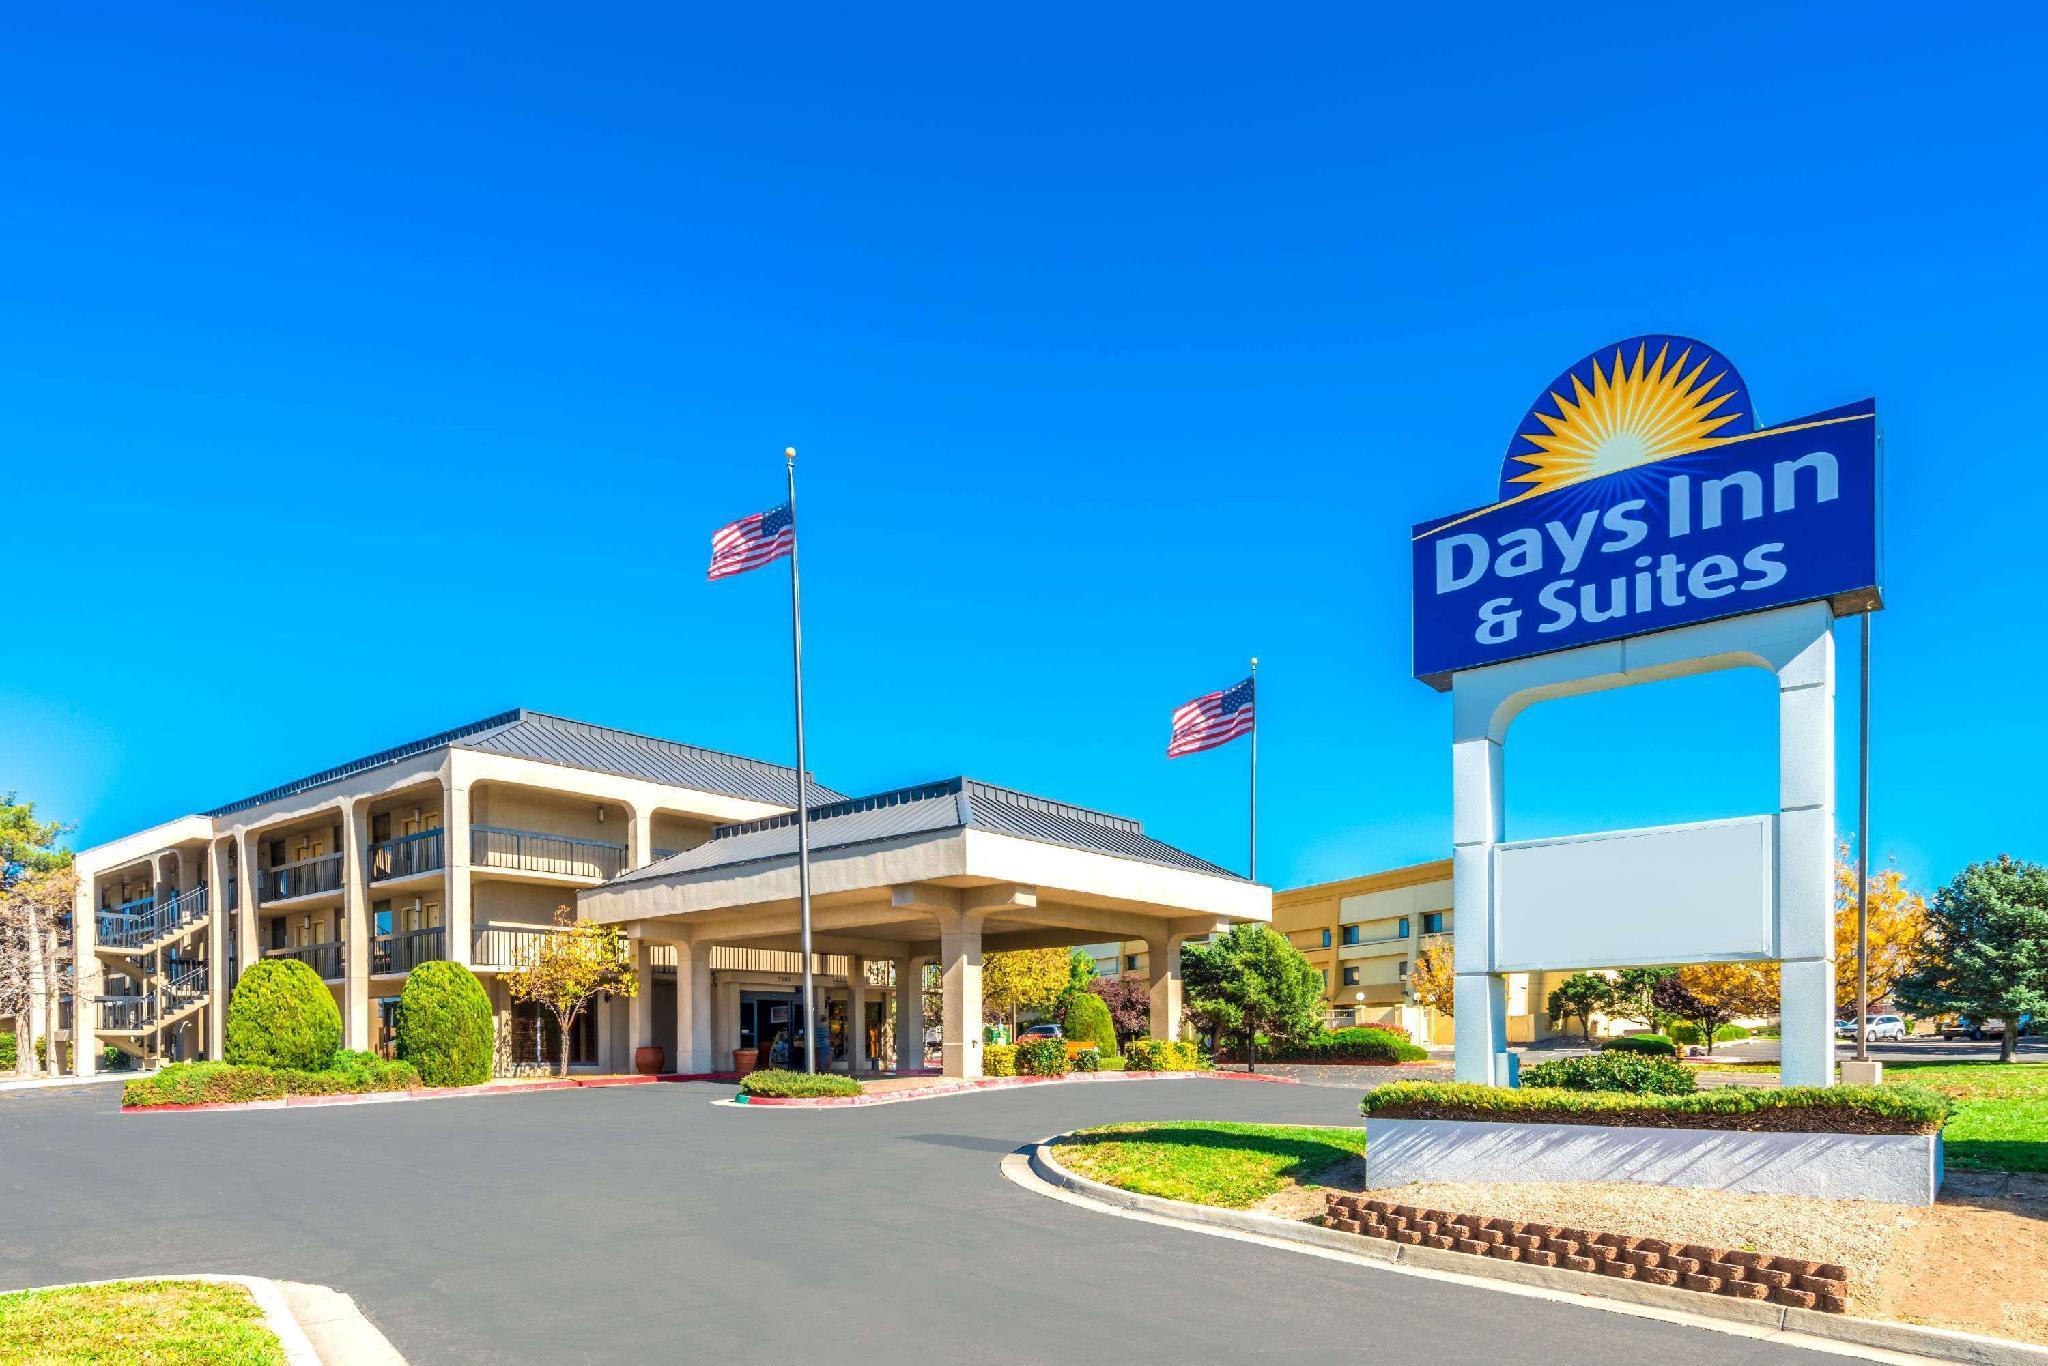 Days Inn And Suites By Wyndham Albuquerque North